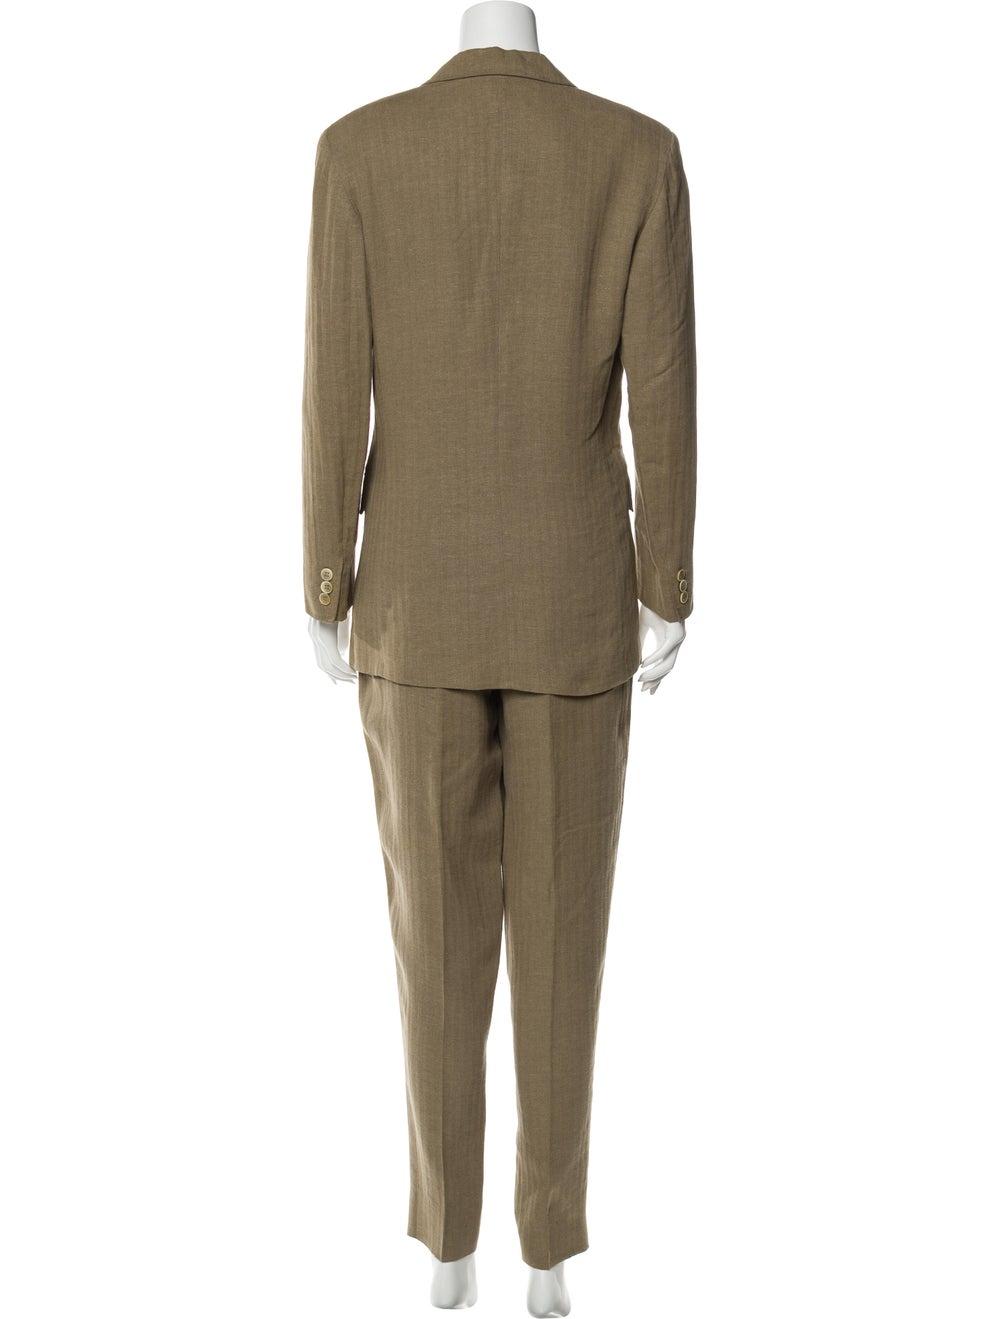 Max Mara Linen Tweed Pattern Pant Set Brown - image 3